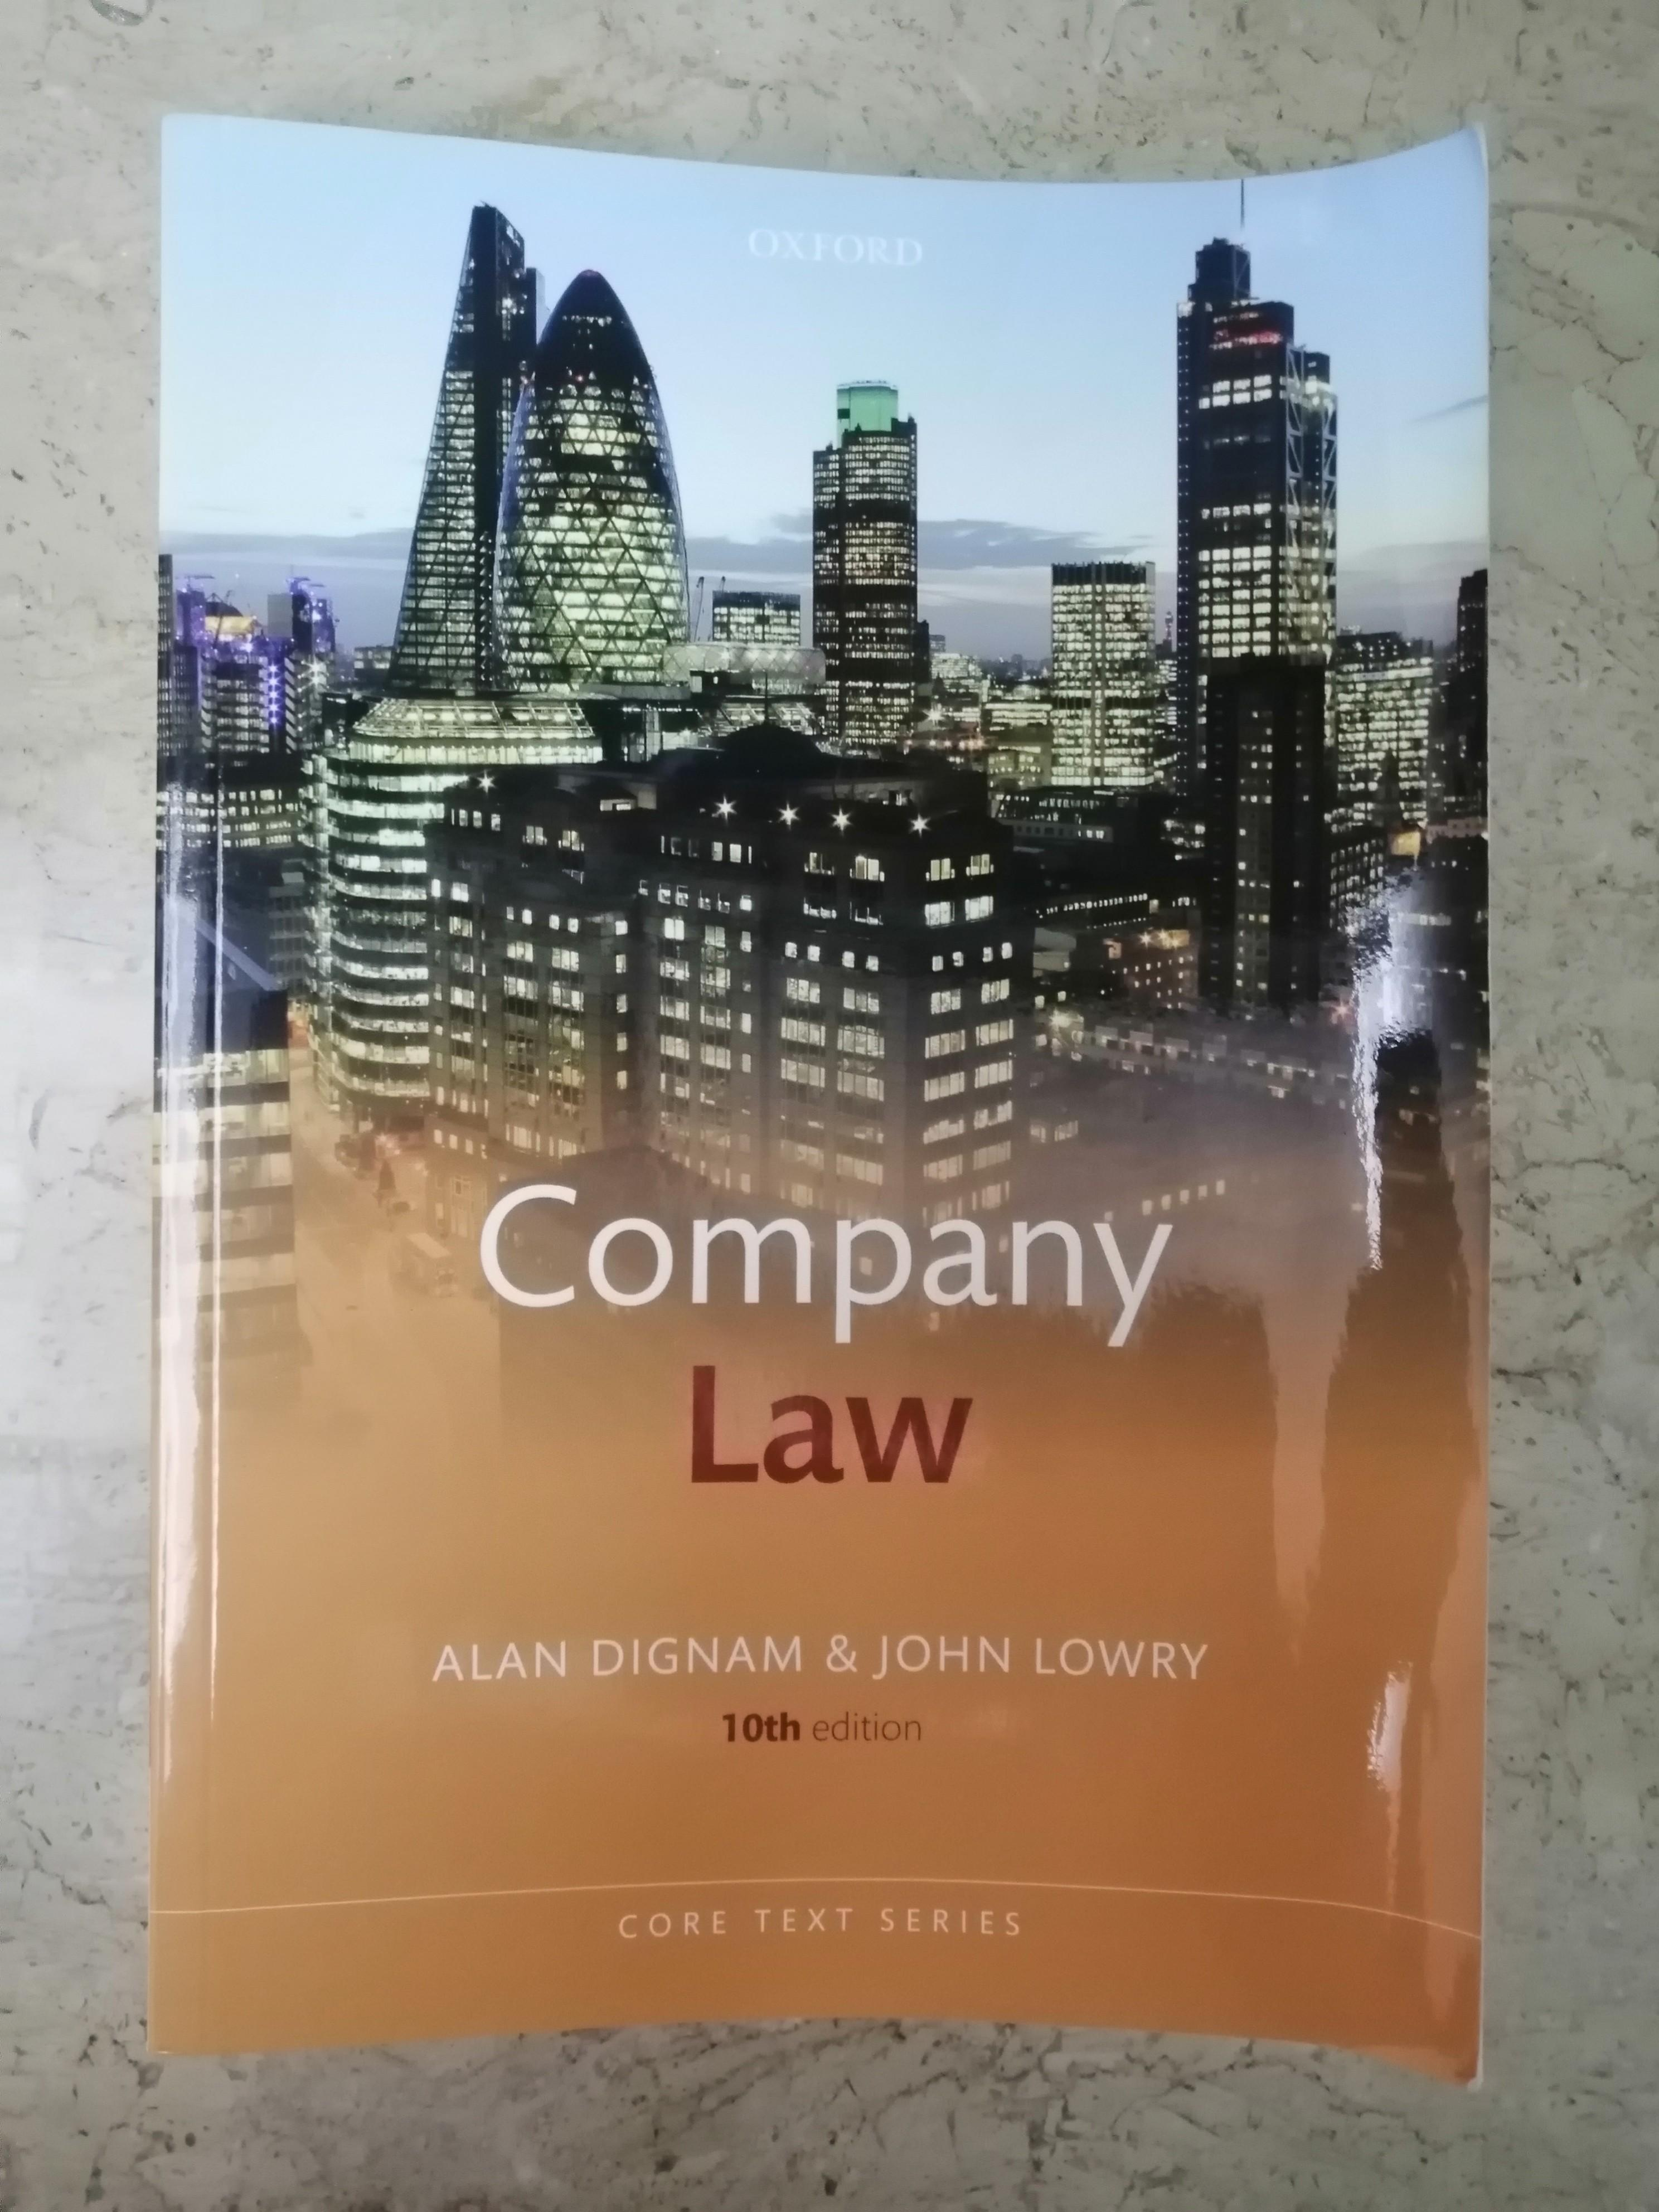 Company Law Textbooks